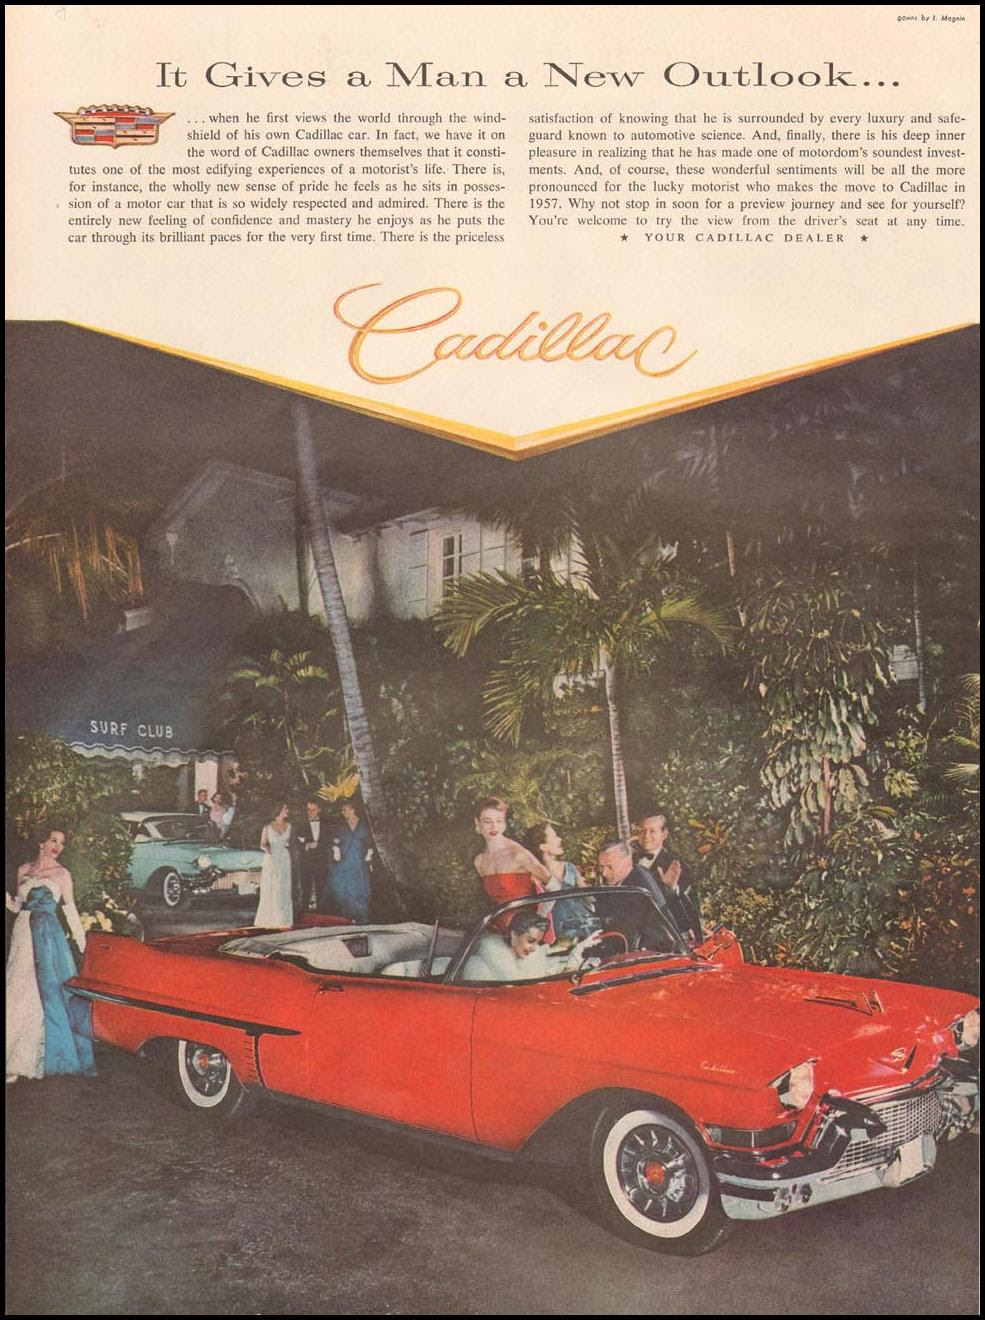 CADILLAC AUTOMOBILES LIFE 04/01/1957 p. 88